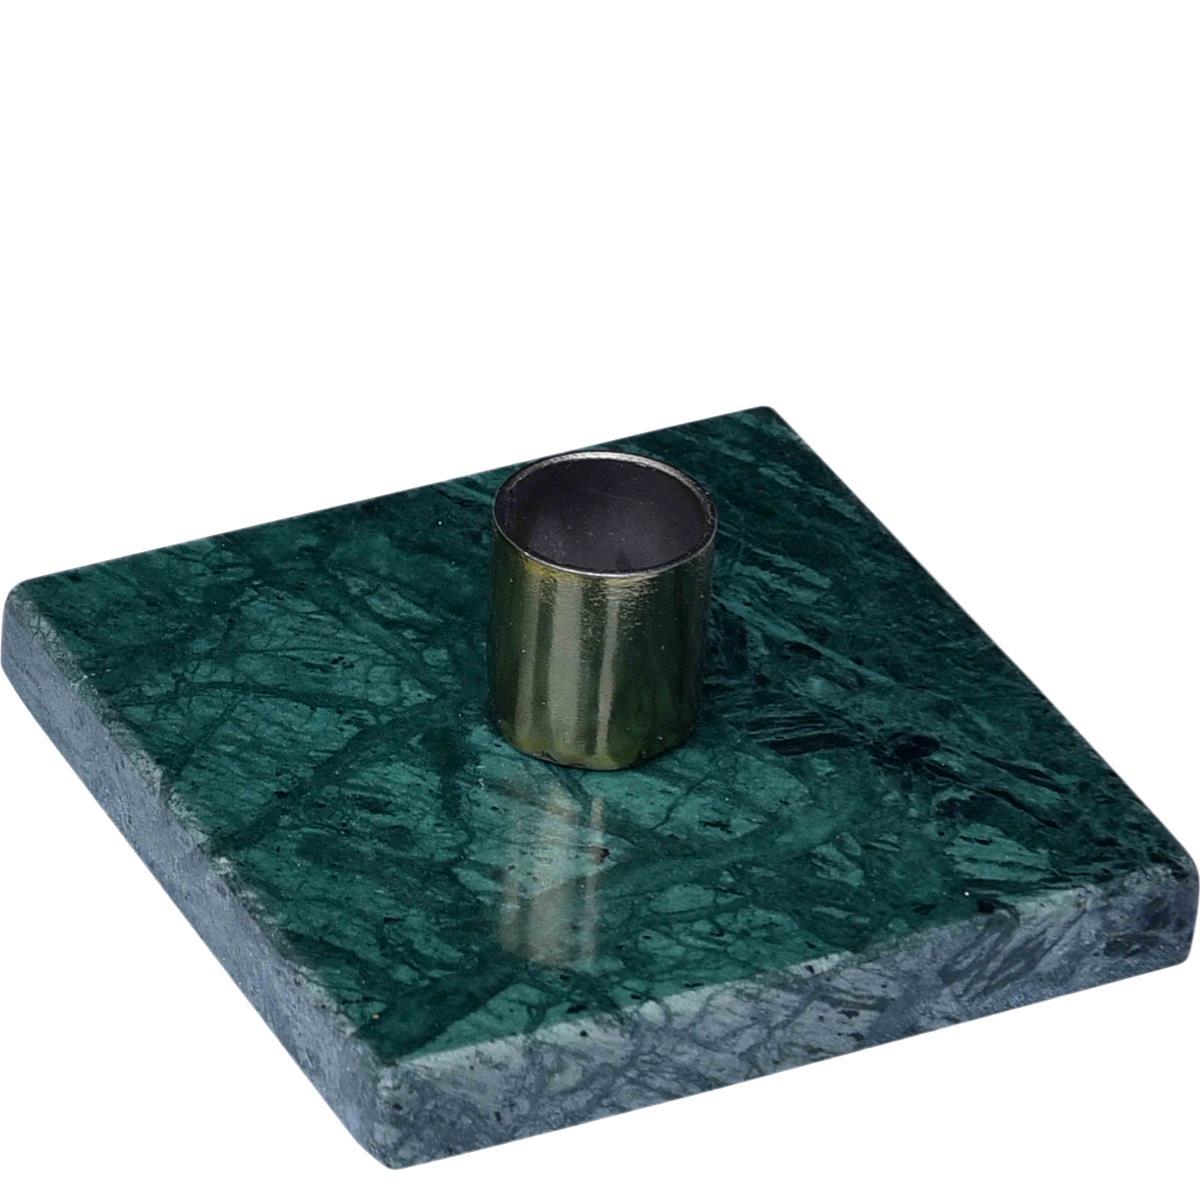 Lysestage i grøn marmor